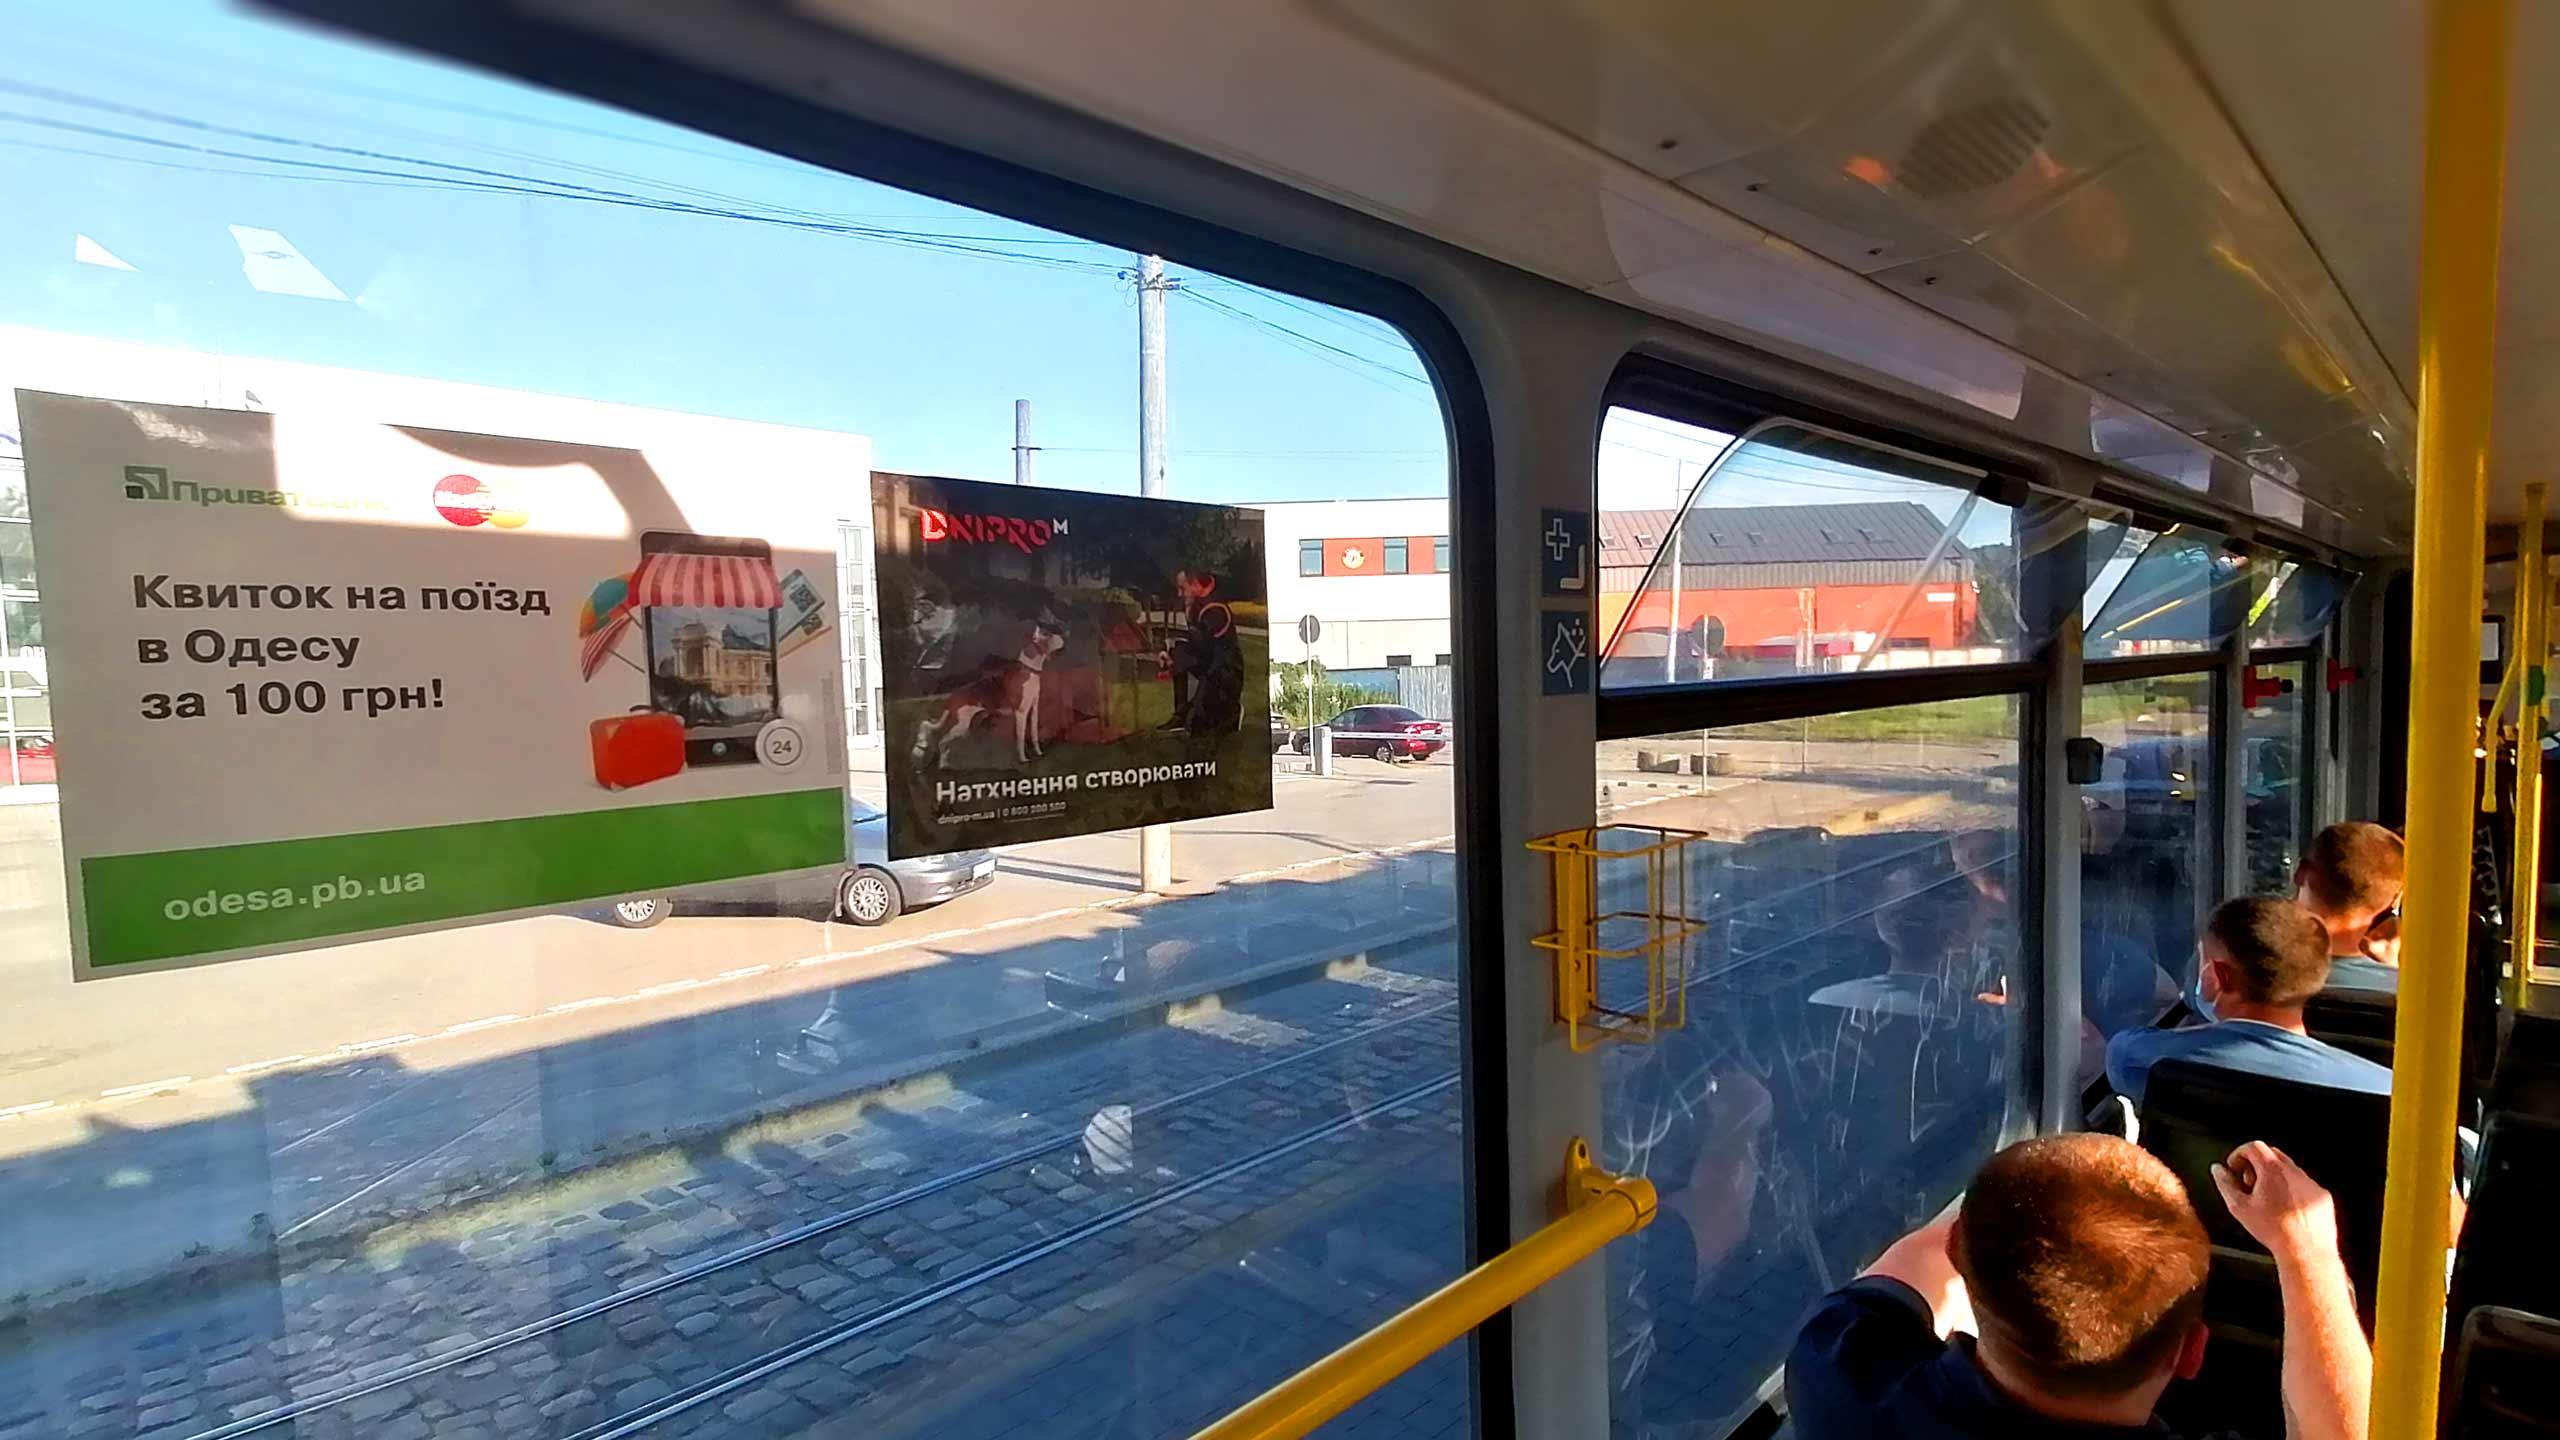 Реклама в трамвае Киев